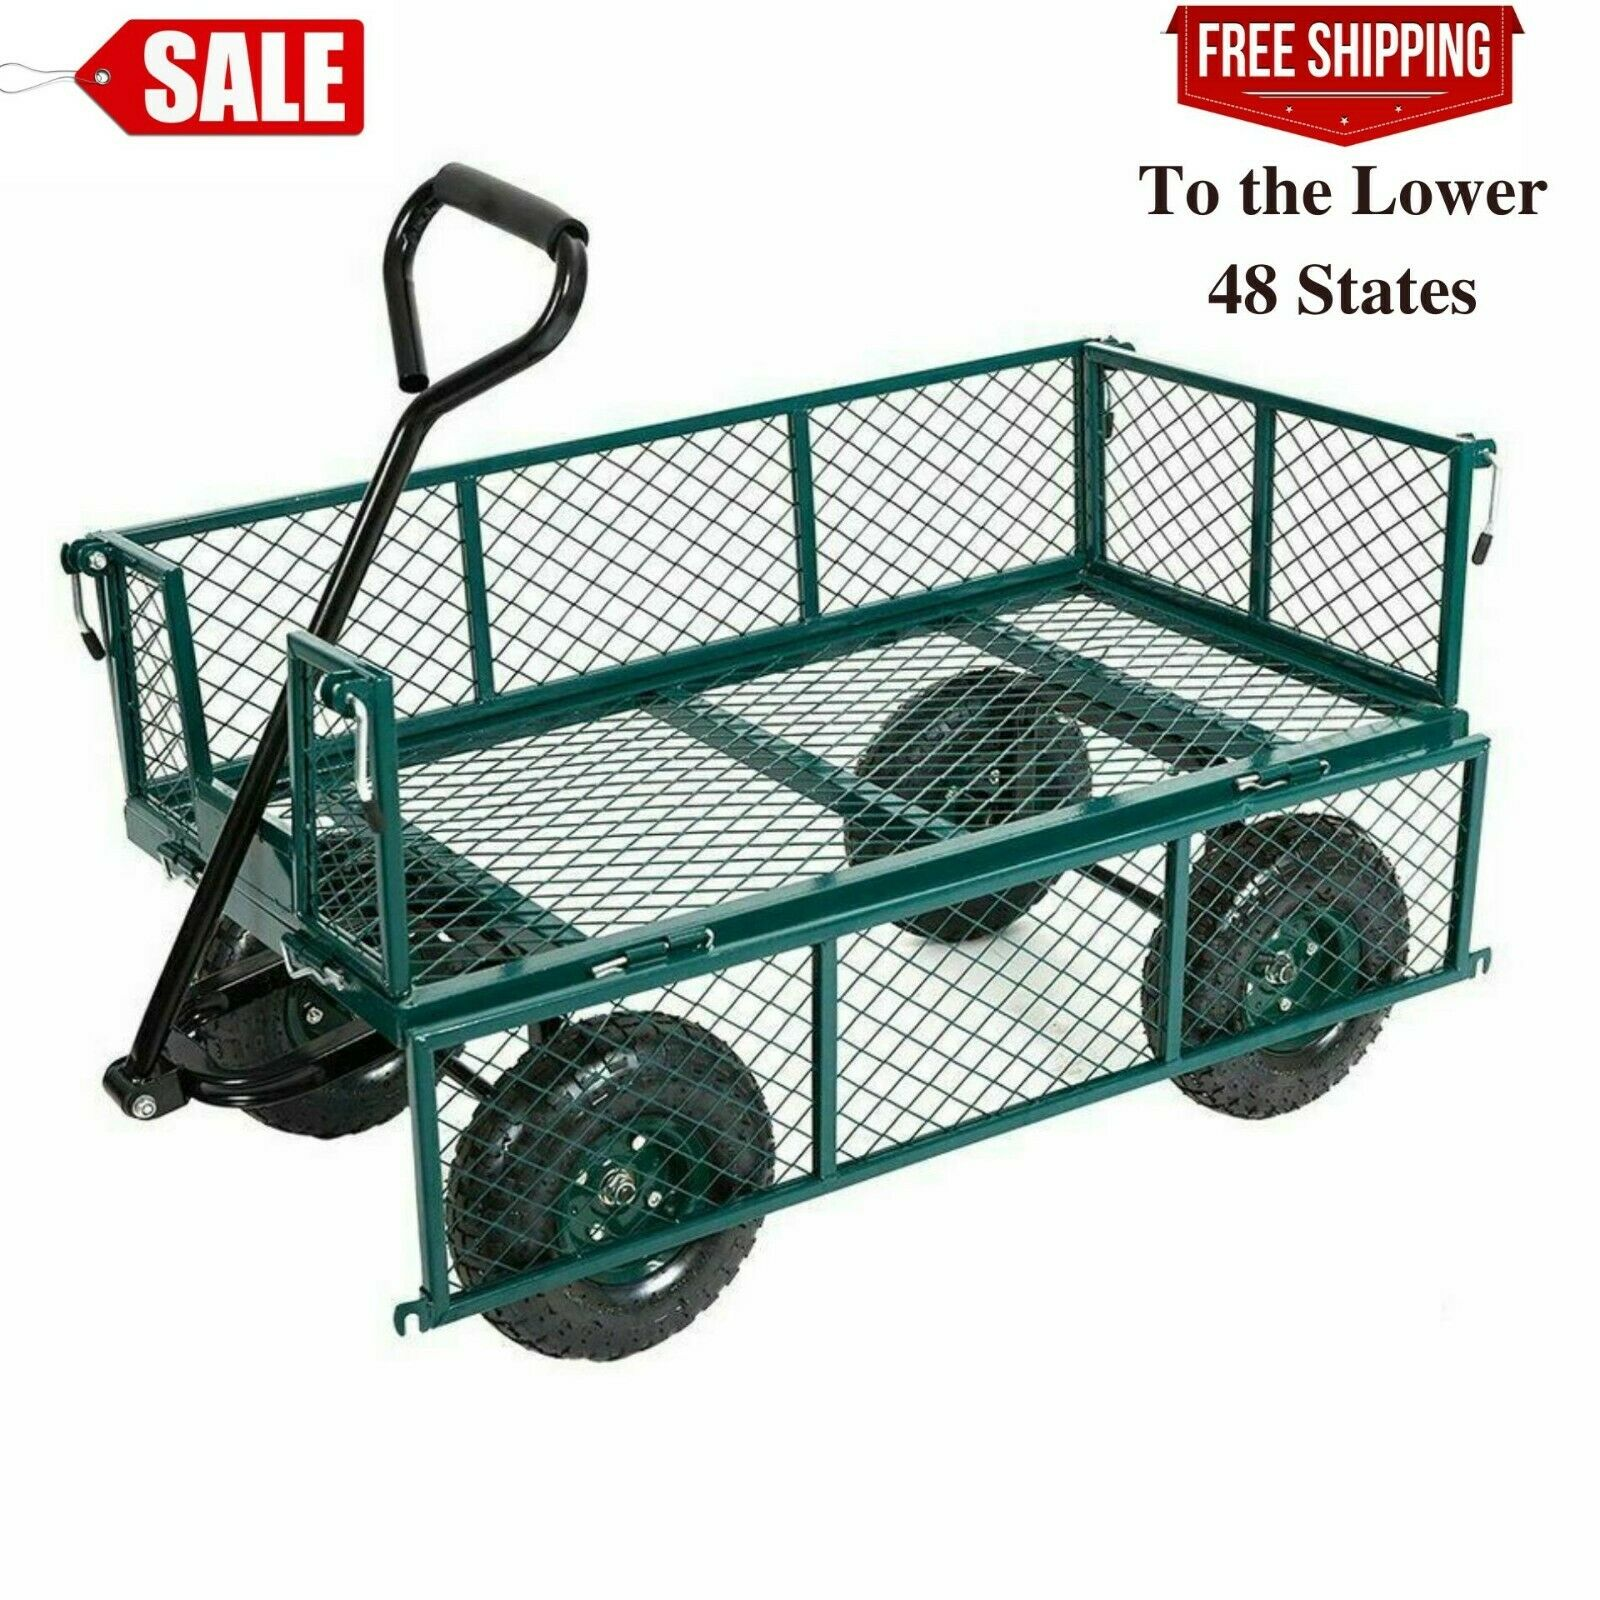 550lbs Garden Cart Heavy Duty Dump Utility Wagon Outdoor Law